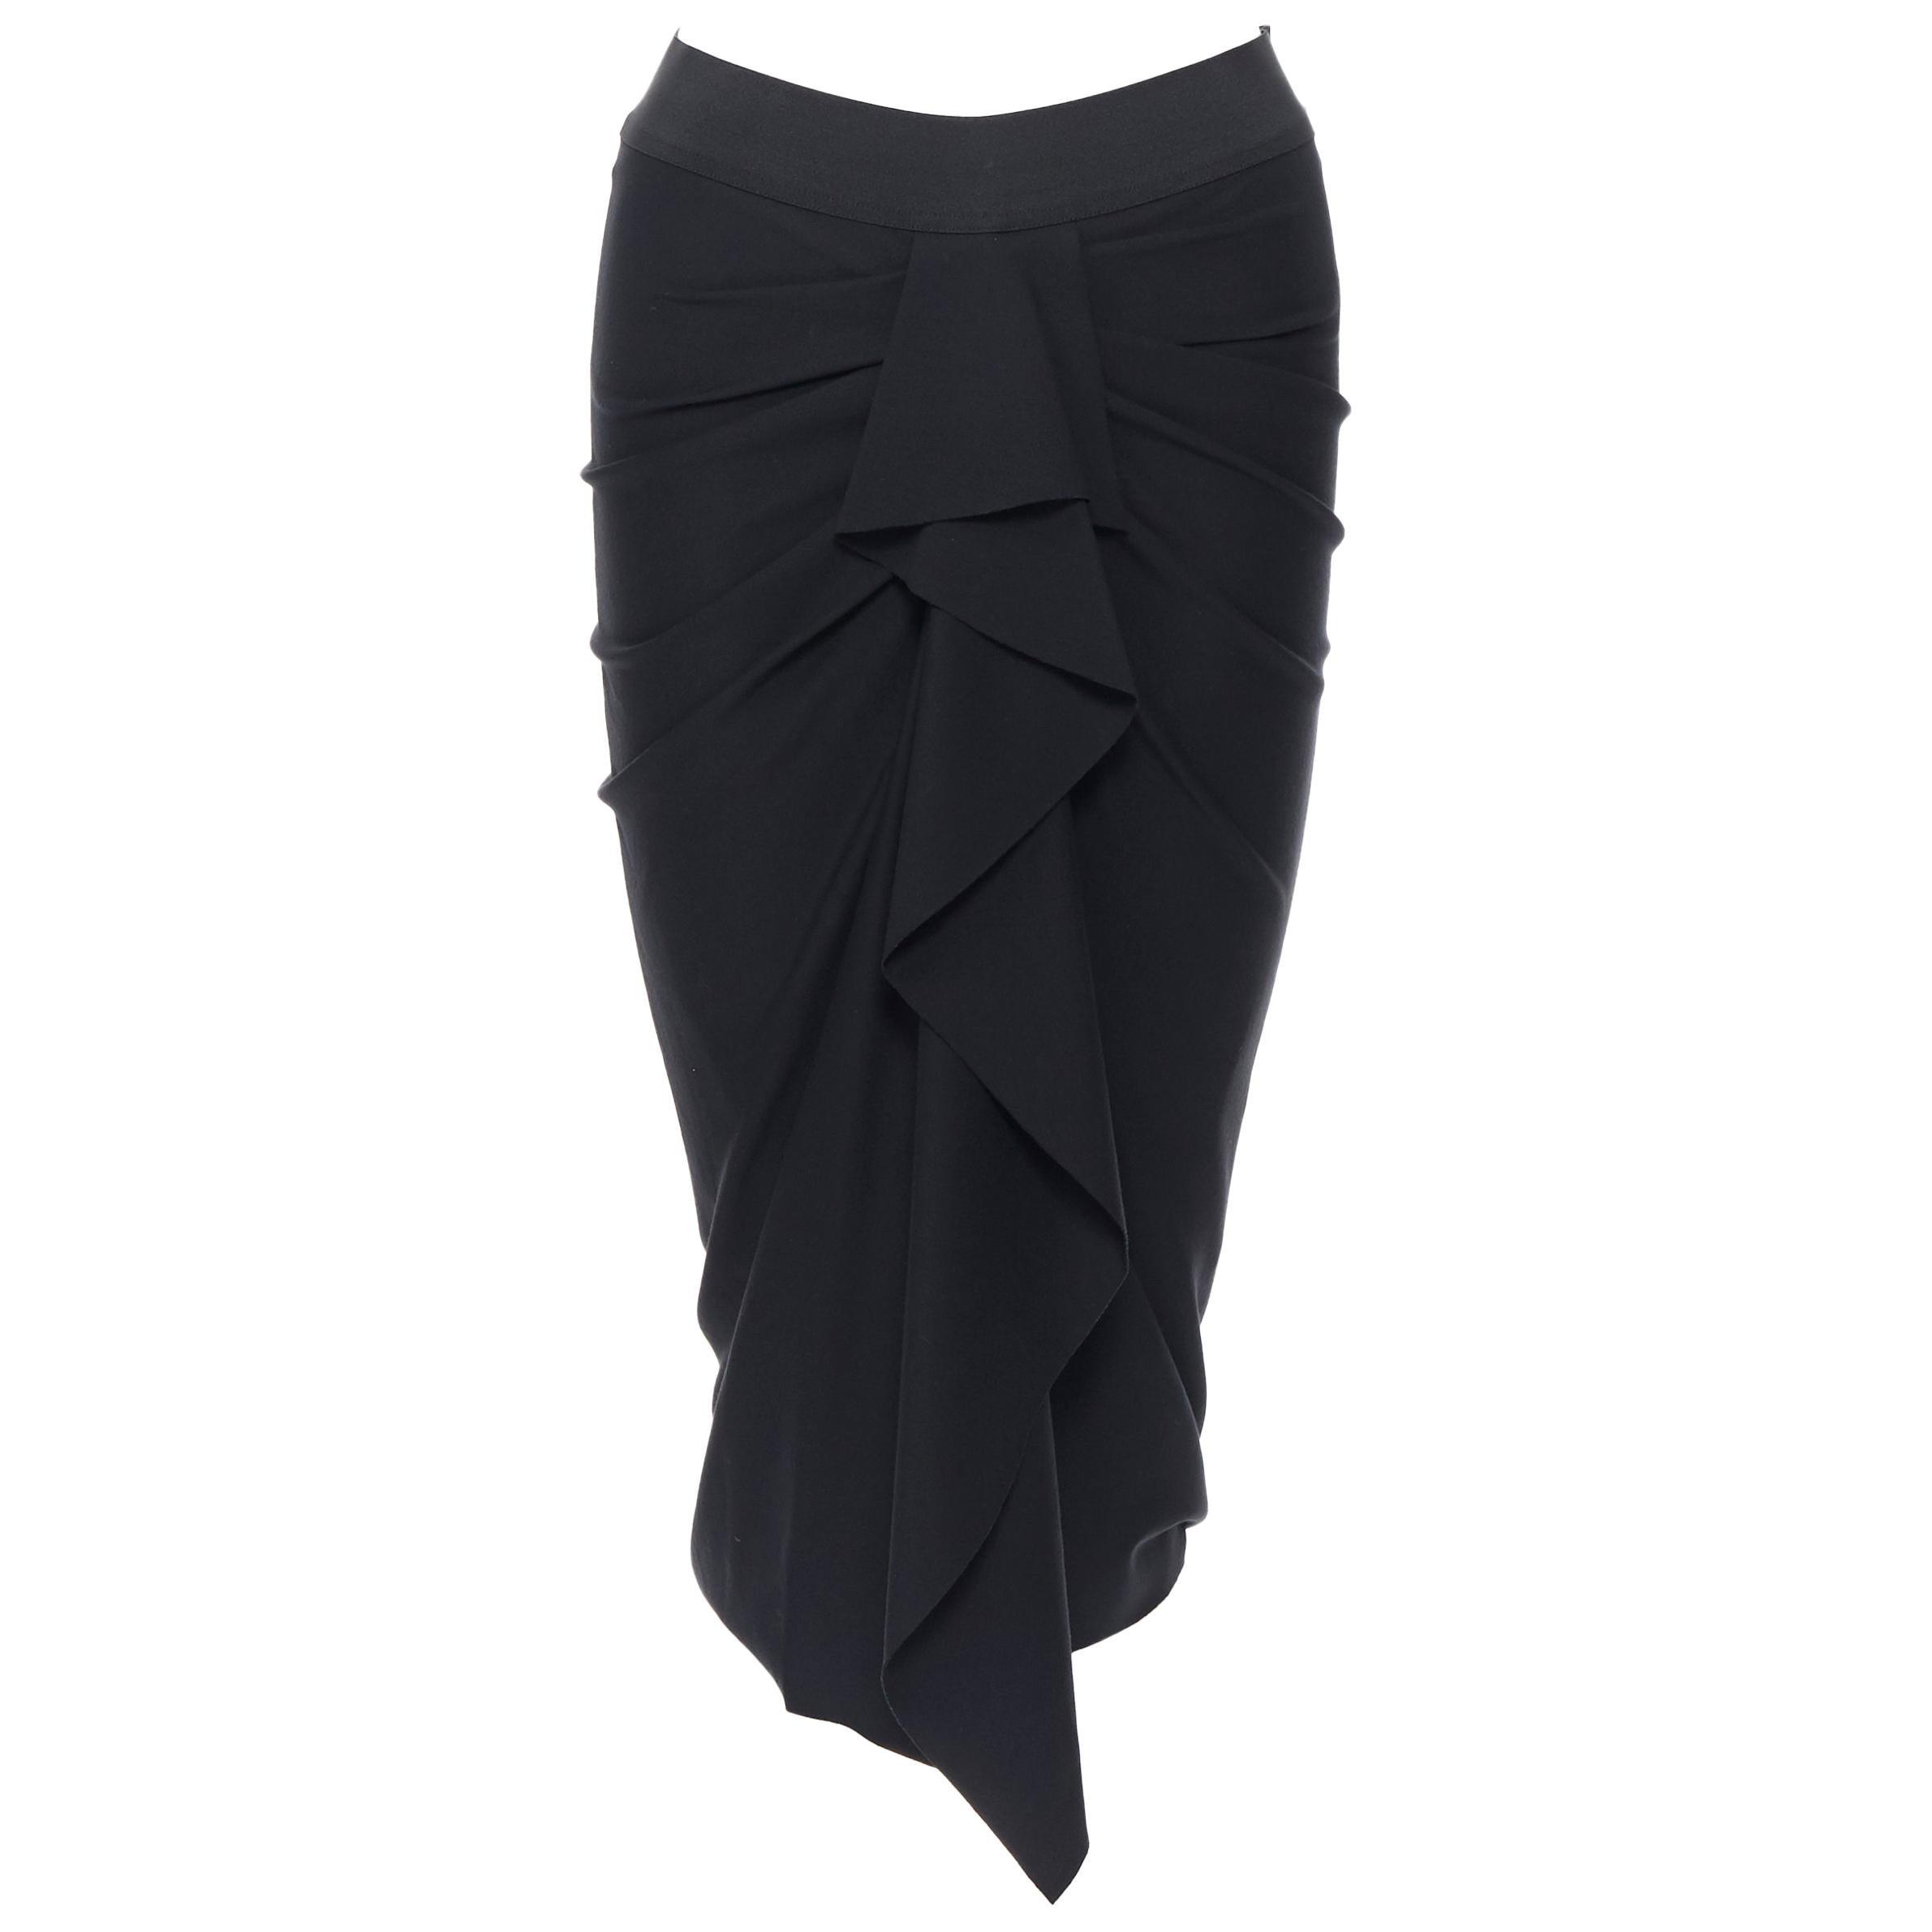 "DONNA KARAN black viscose blend elastic waist ruched ruffle skirt US6 26"""